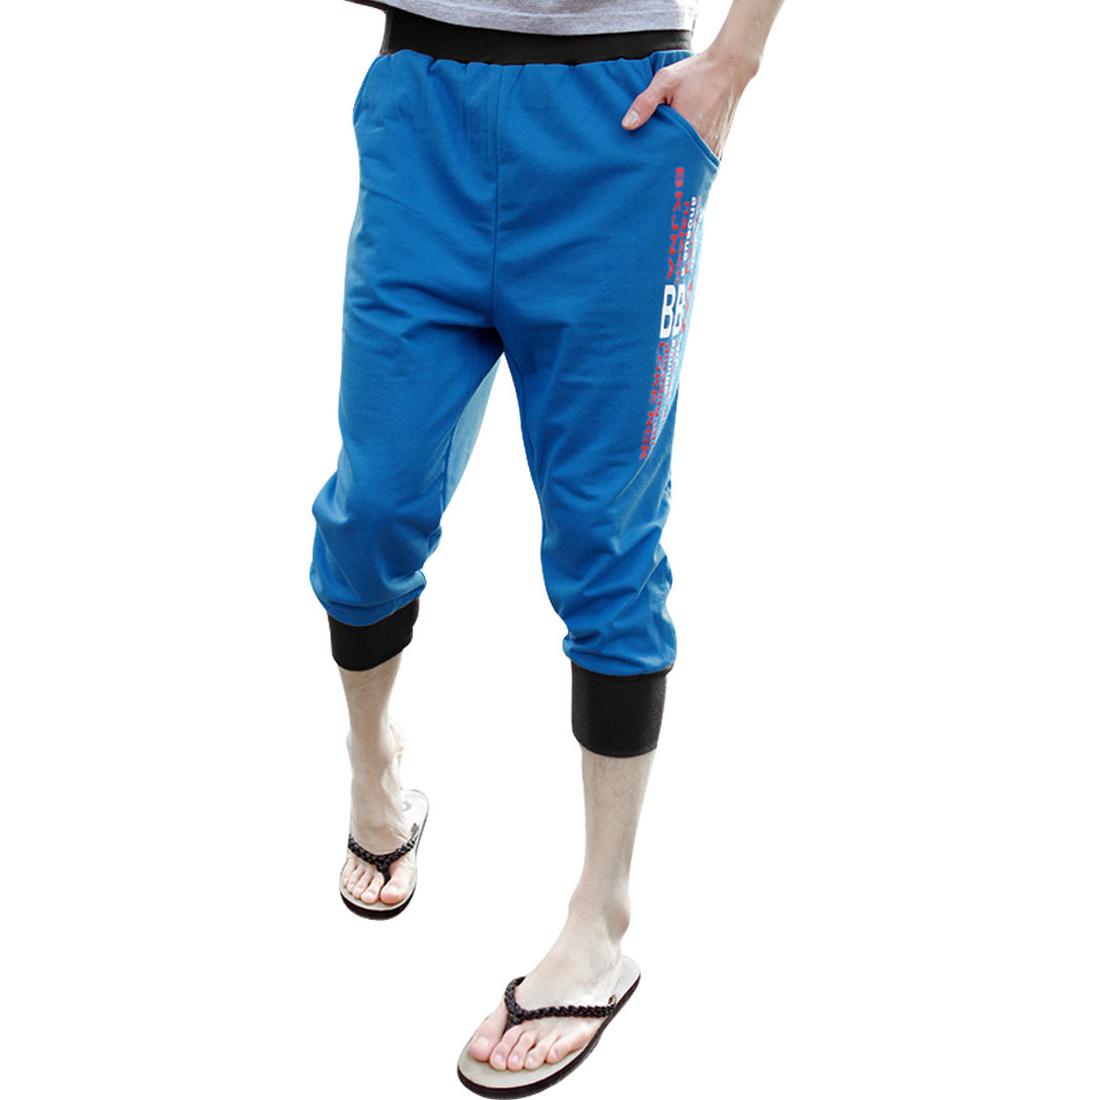 Mens Drawstring Waist Letters Prints Side Slant Pockets Blue Capris Pants W29